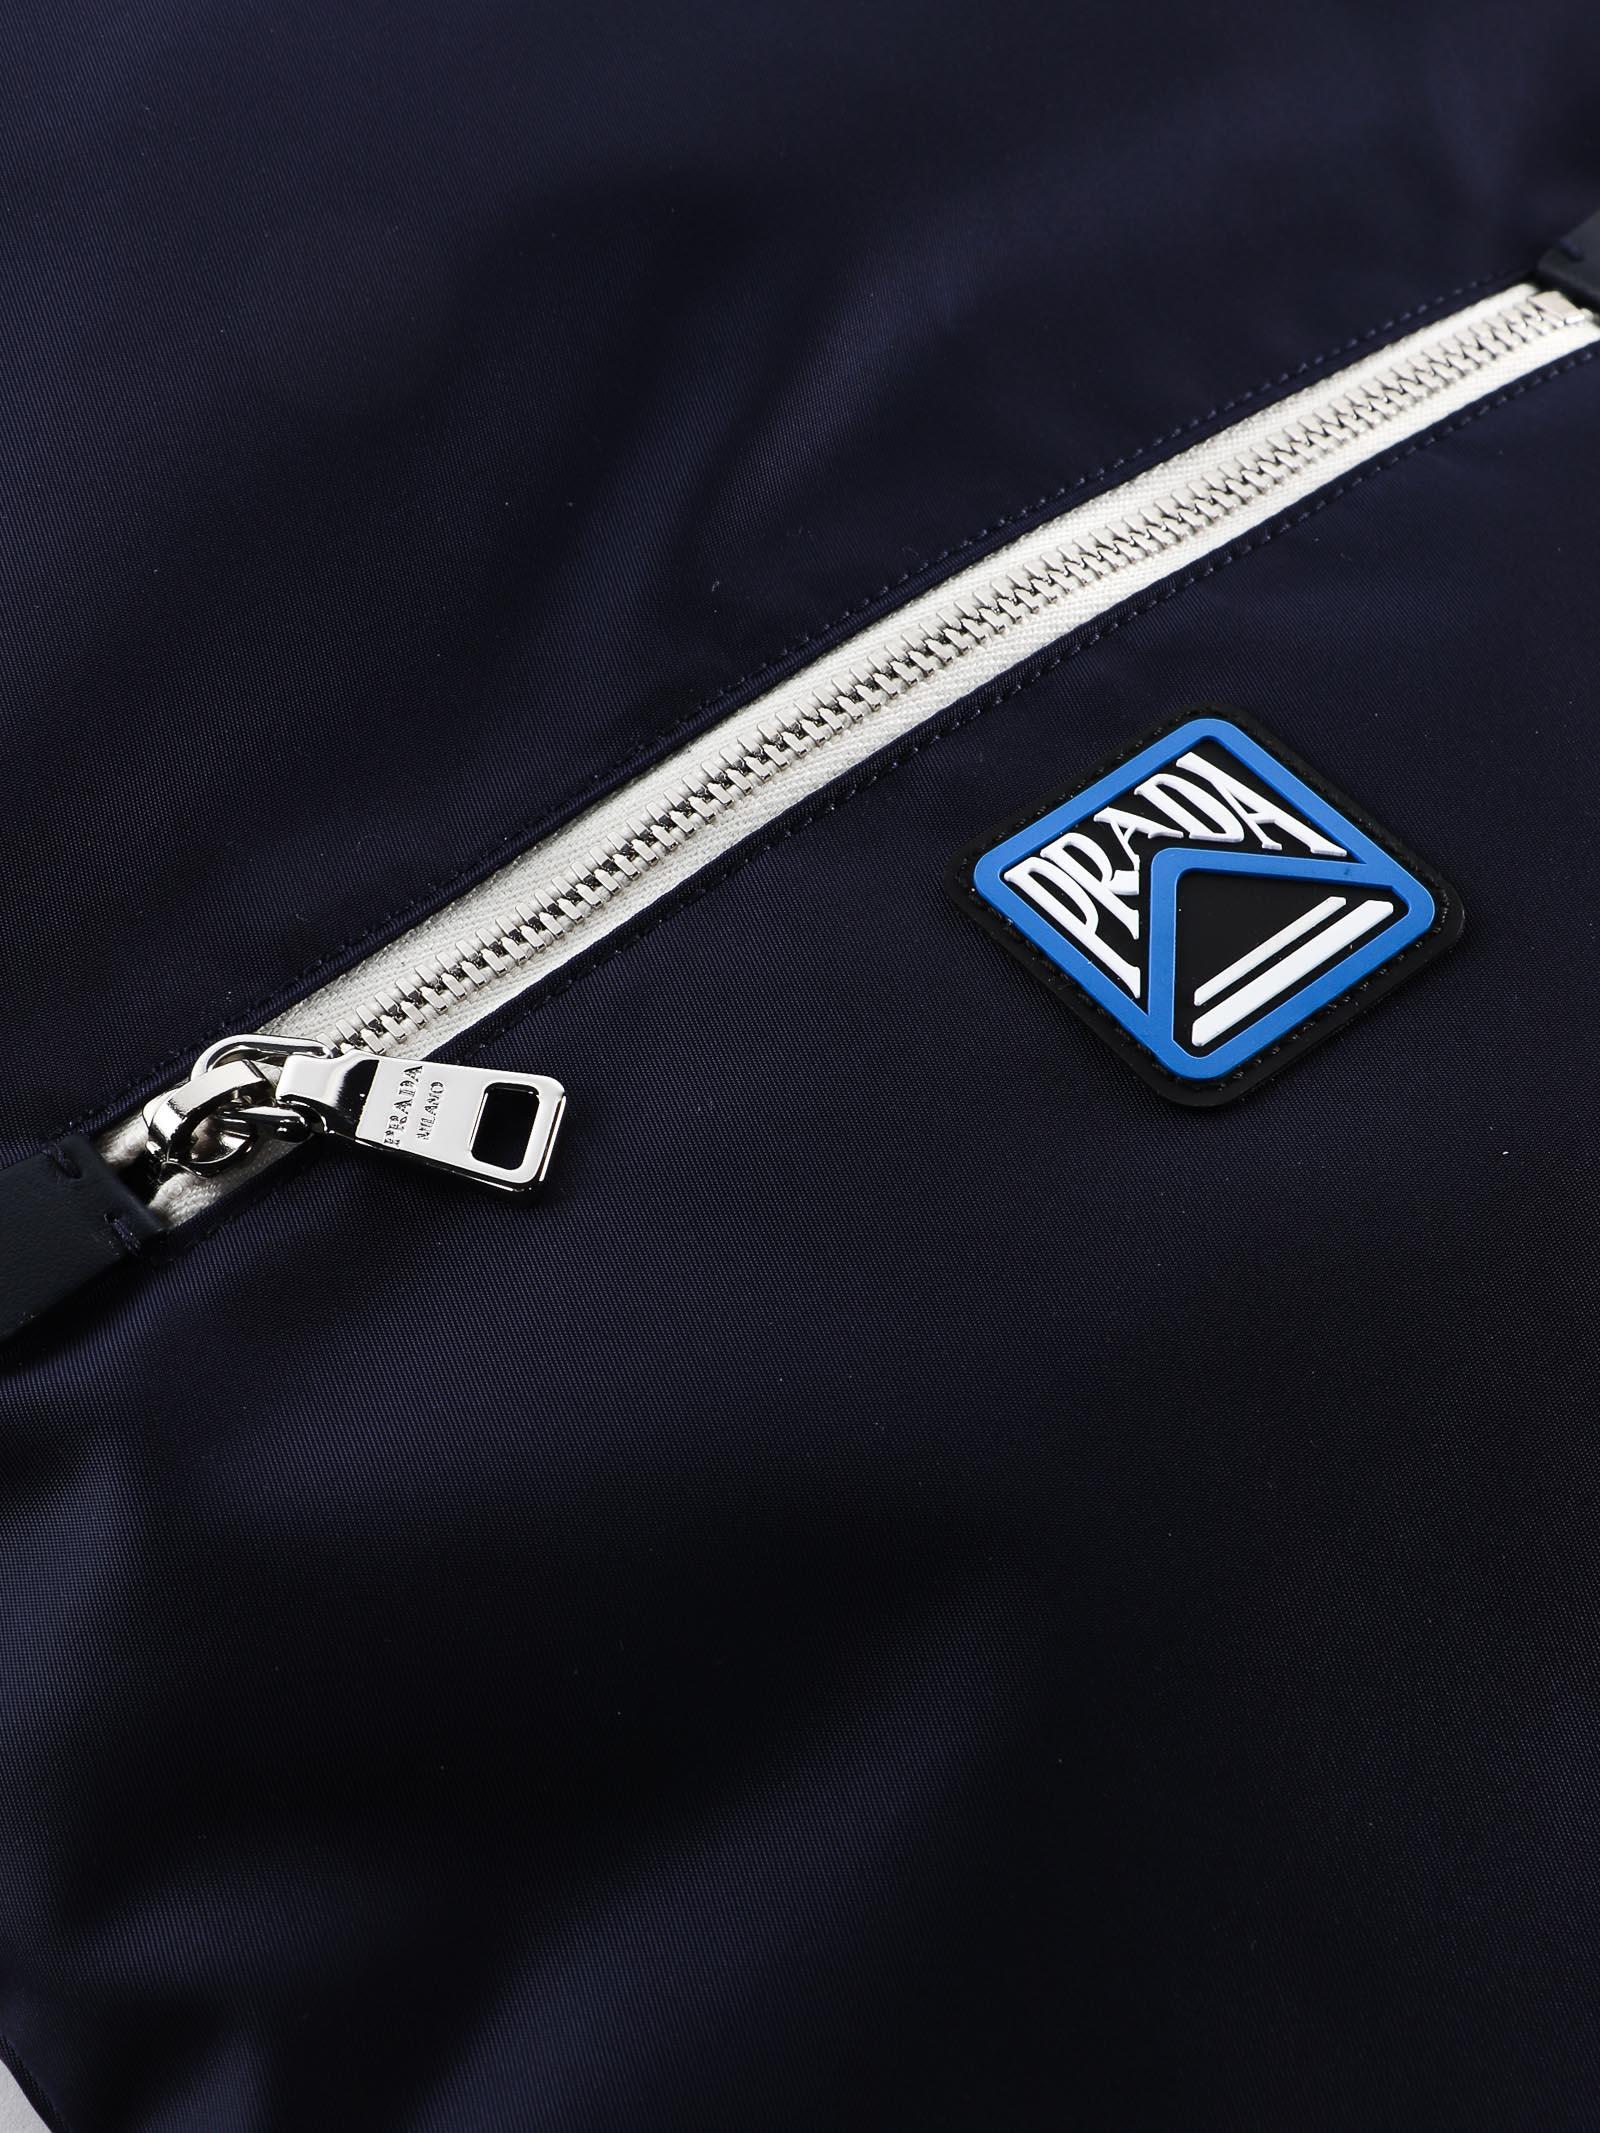 796b4cbc3e21 Prada Prada Drawstring Backpack - Baltico - 10795374 | italist